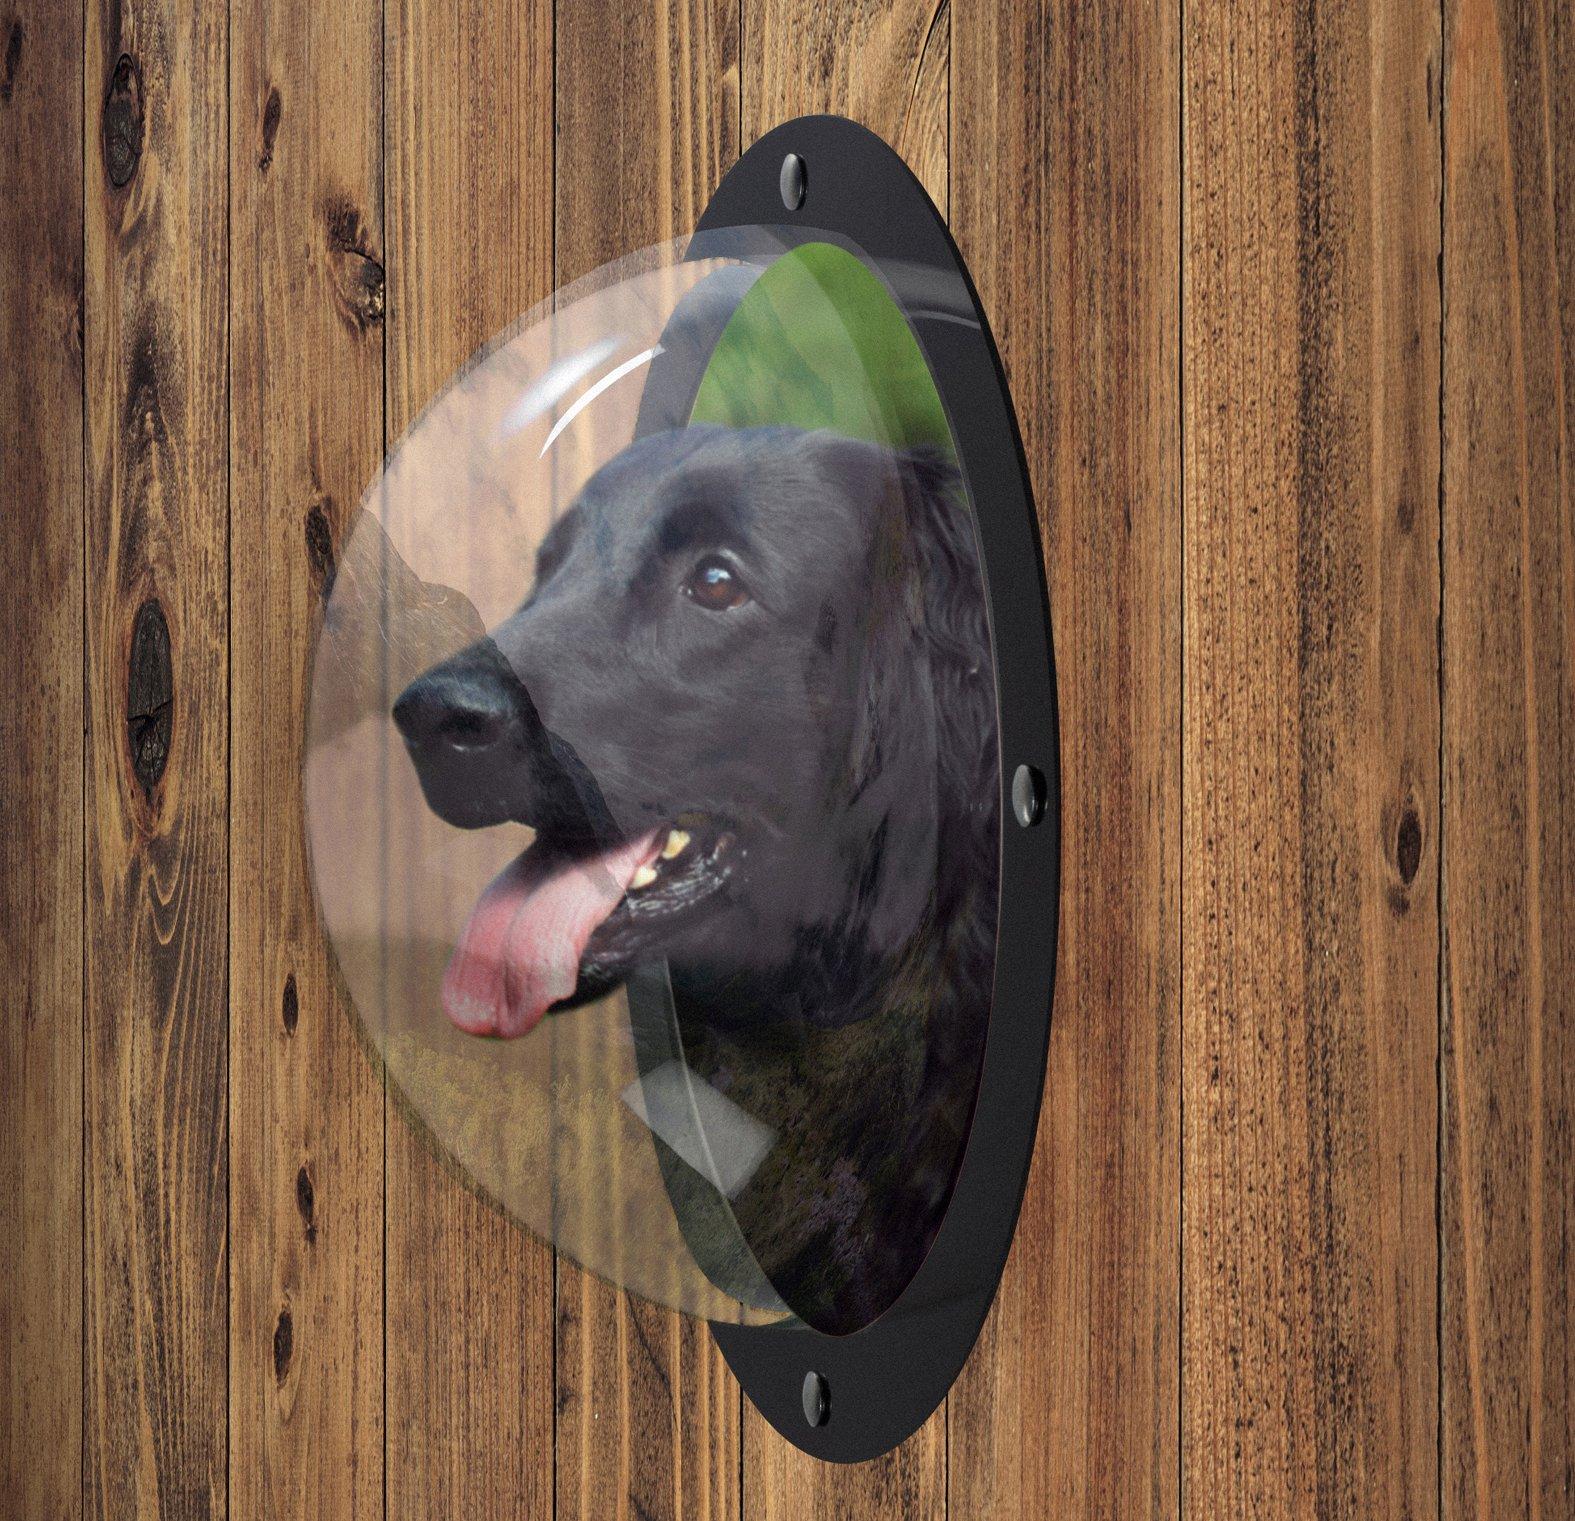 FurryFriends Pet Window - Acrylic Dog Window/Peep Hole for Door or Gate by FurryFriends (Image #2)